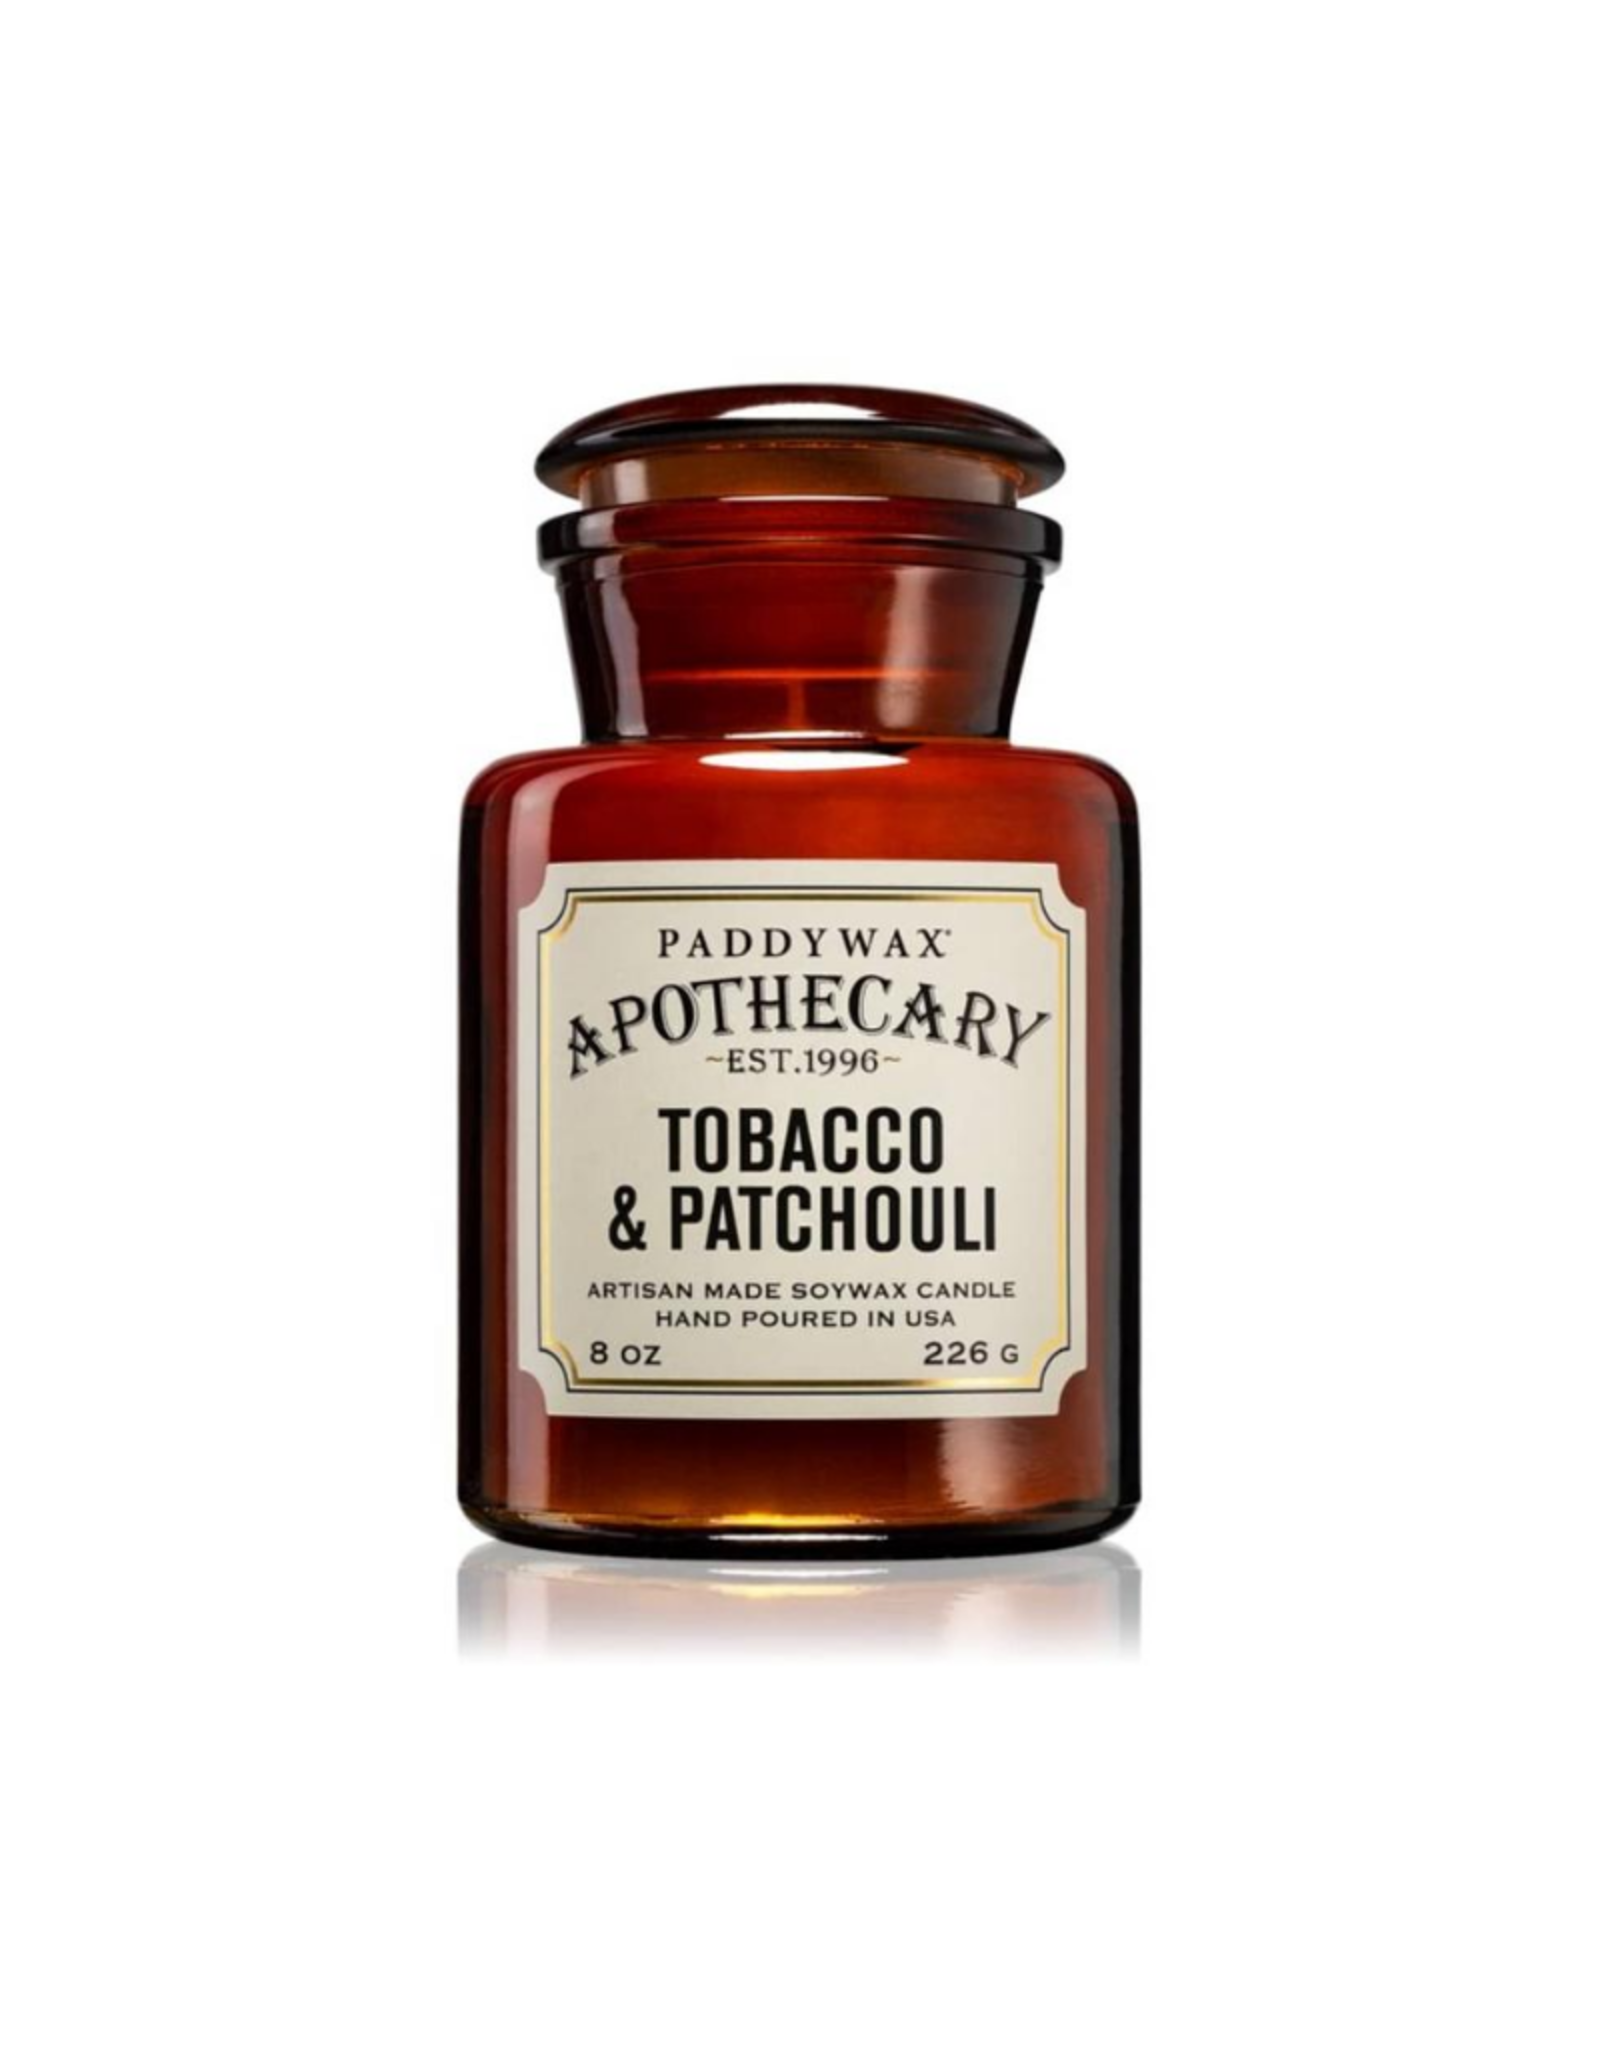 Paddywax Geurkaars sojawas - Tobacco & Patchouli 226g